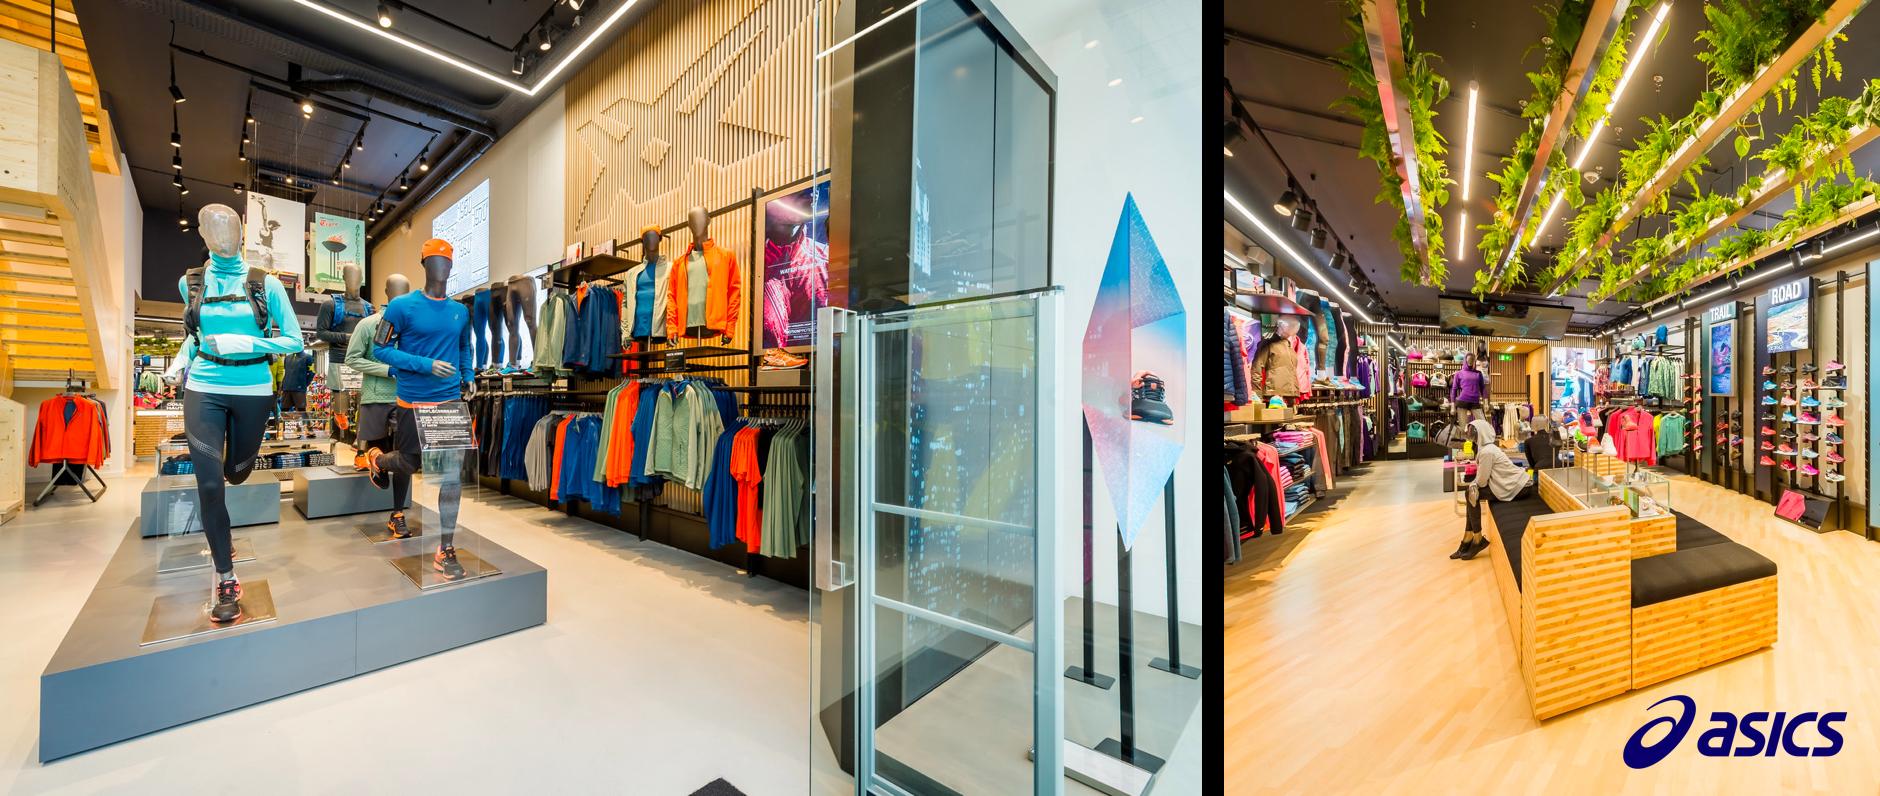 Asics, Sportswear, Sportsfashion Visual Merchandising, Visual Merchandising Software, Planogram Software, Planogram Software for retail